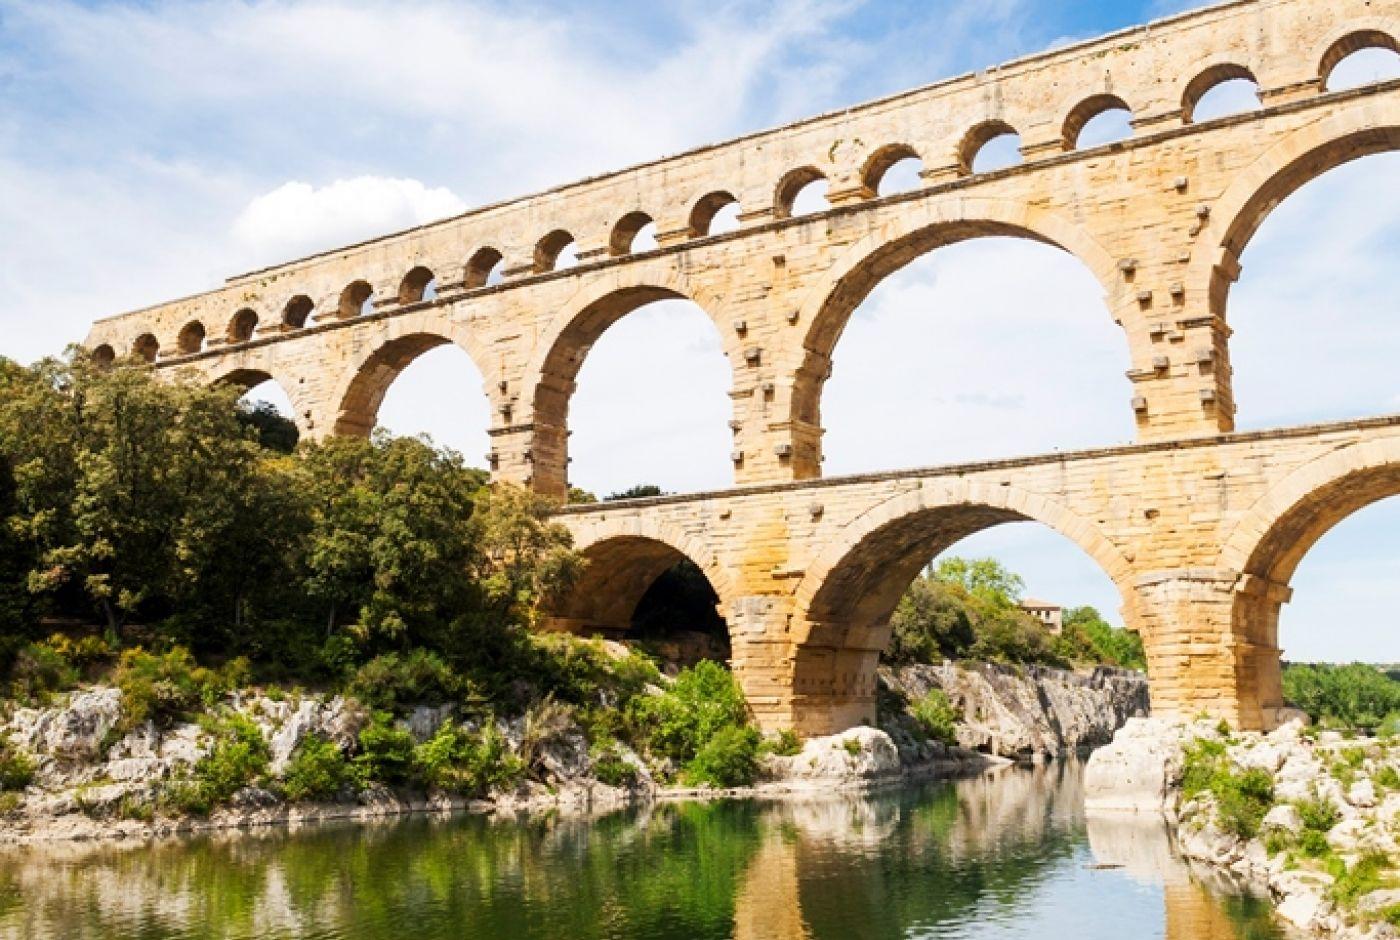 pont_du_gard_grands_sites_de_france_credits_a_rodgriguez.jpg